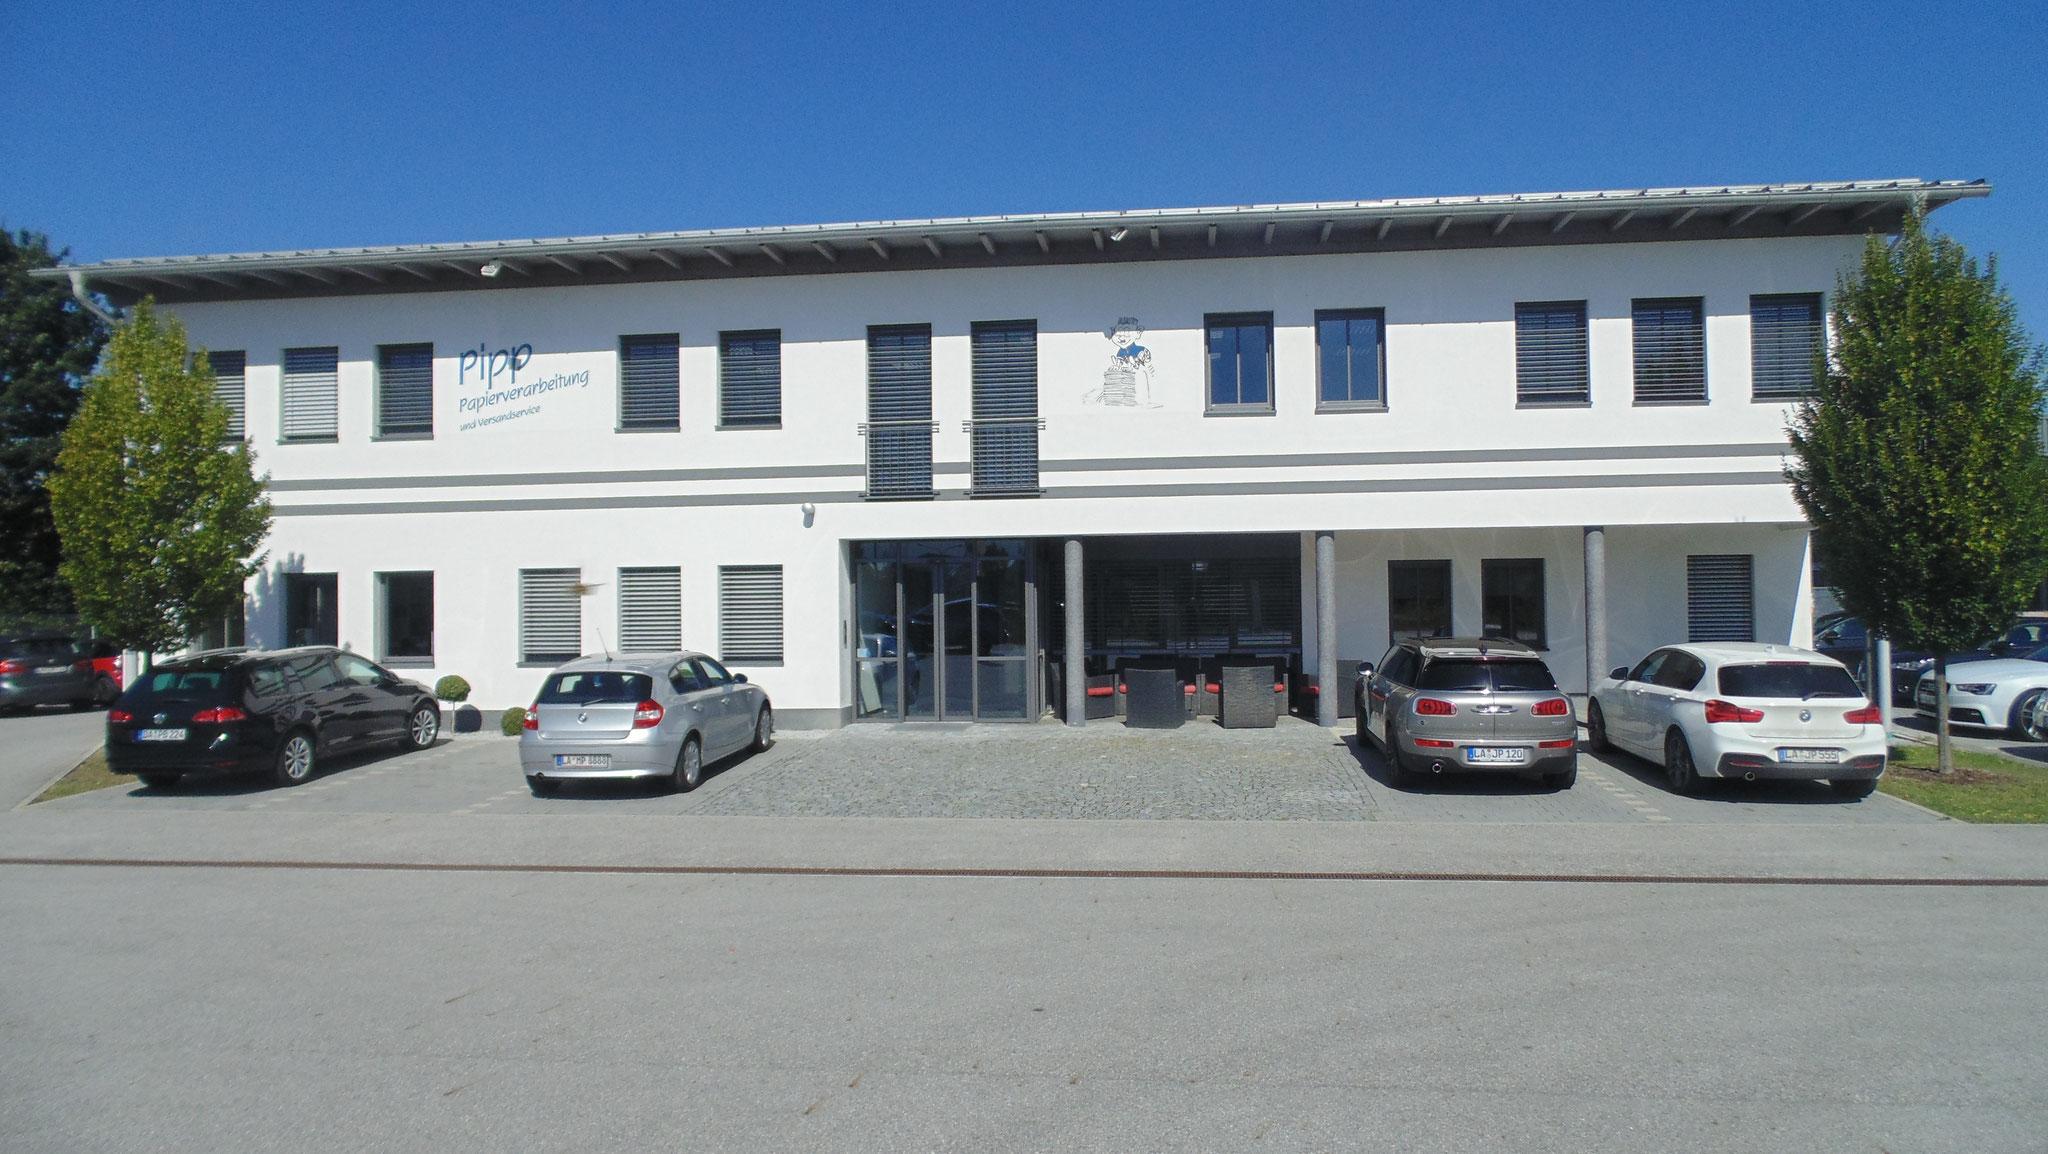 Neuabau Betriebsgebäude/Papierverarbeitsbetireb Firma Pipp, Essenbach 2009